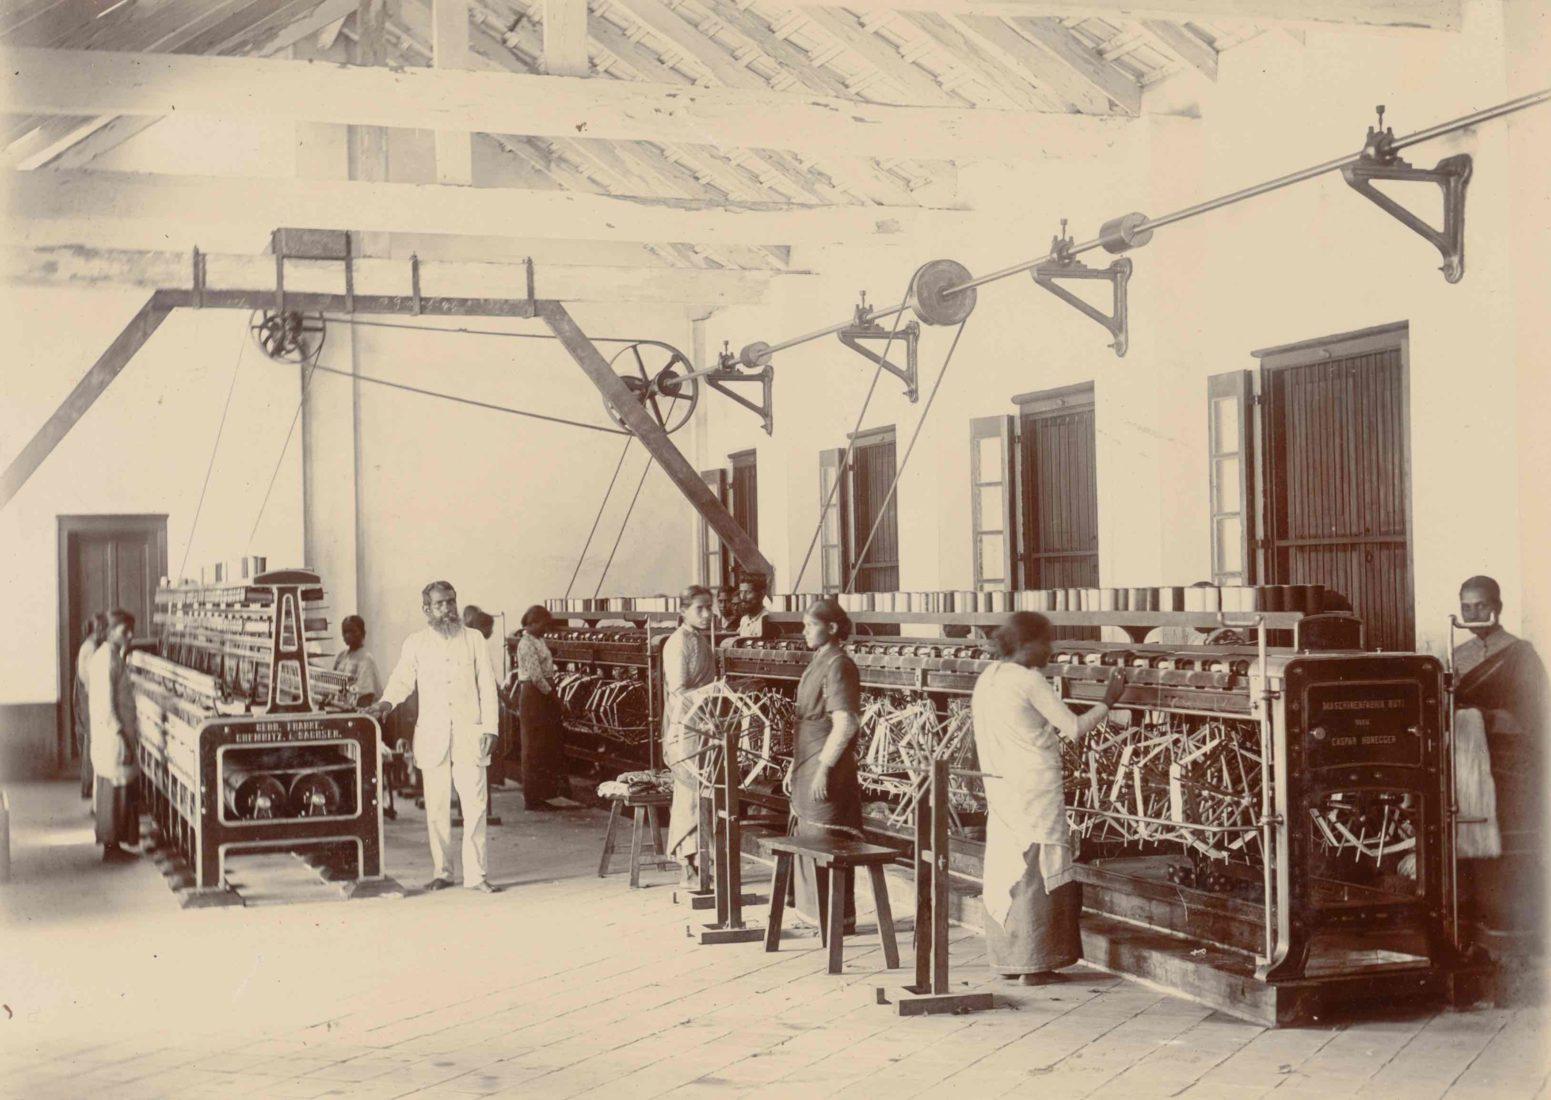 Fabrique de tissu à Calicut, fin du XIXe siècle